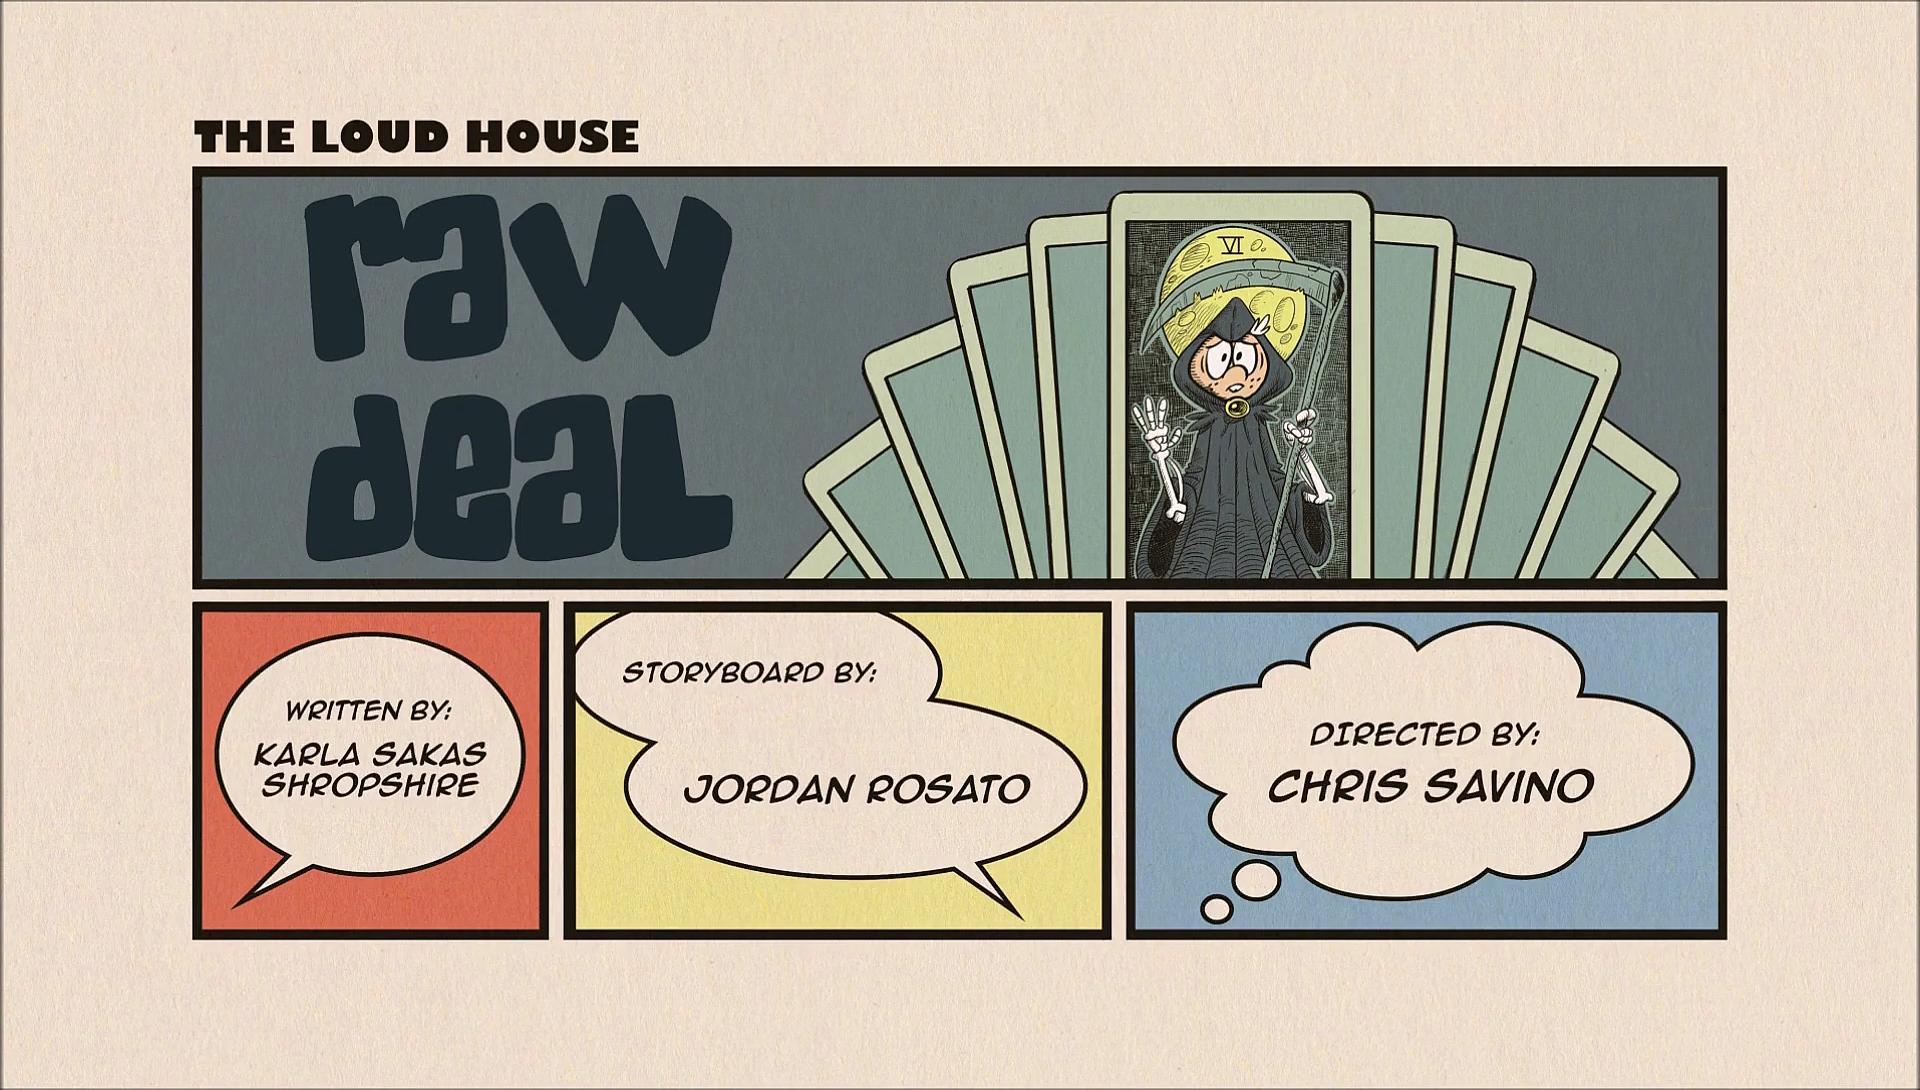 the loud house raw deal script